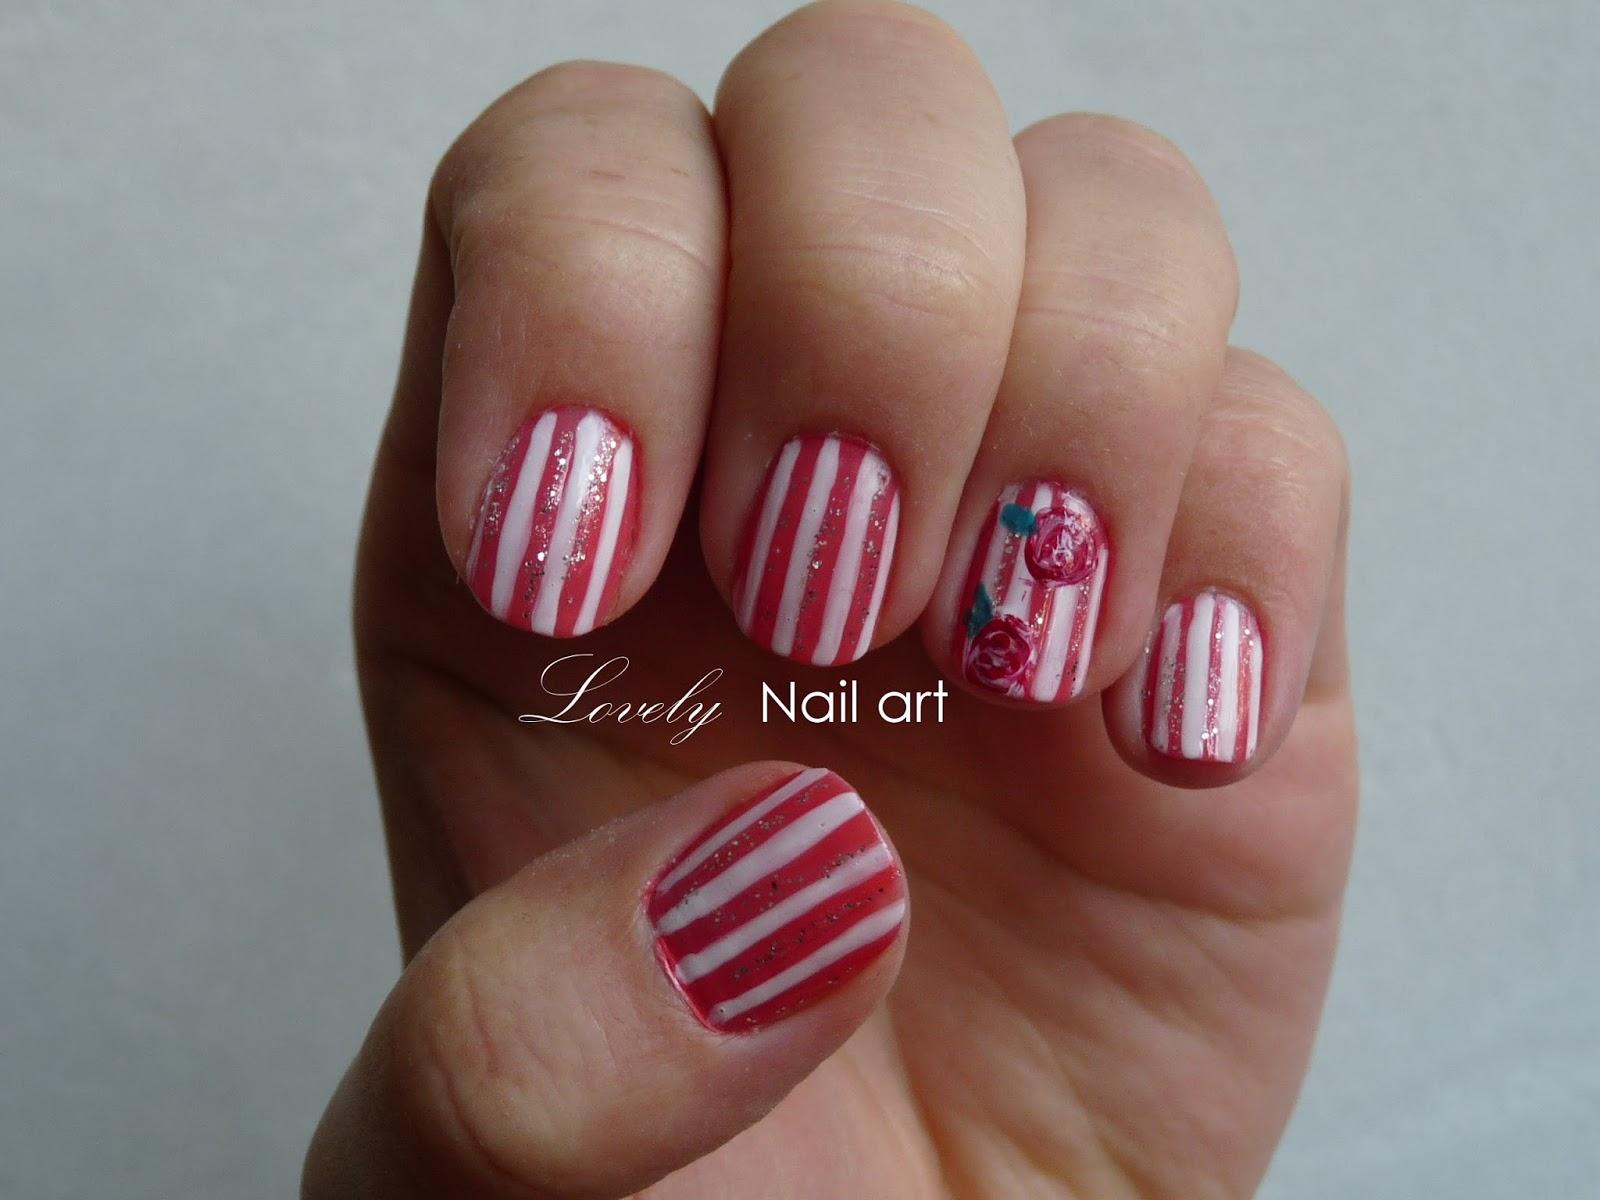 August Nail Art: Lovely Nail Art: August 2013